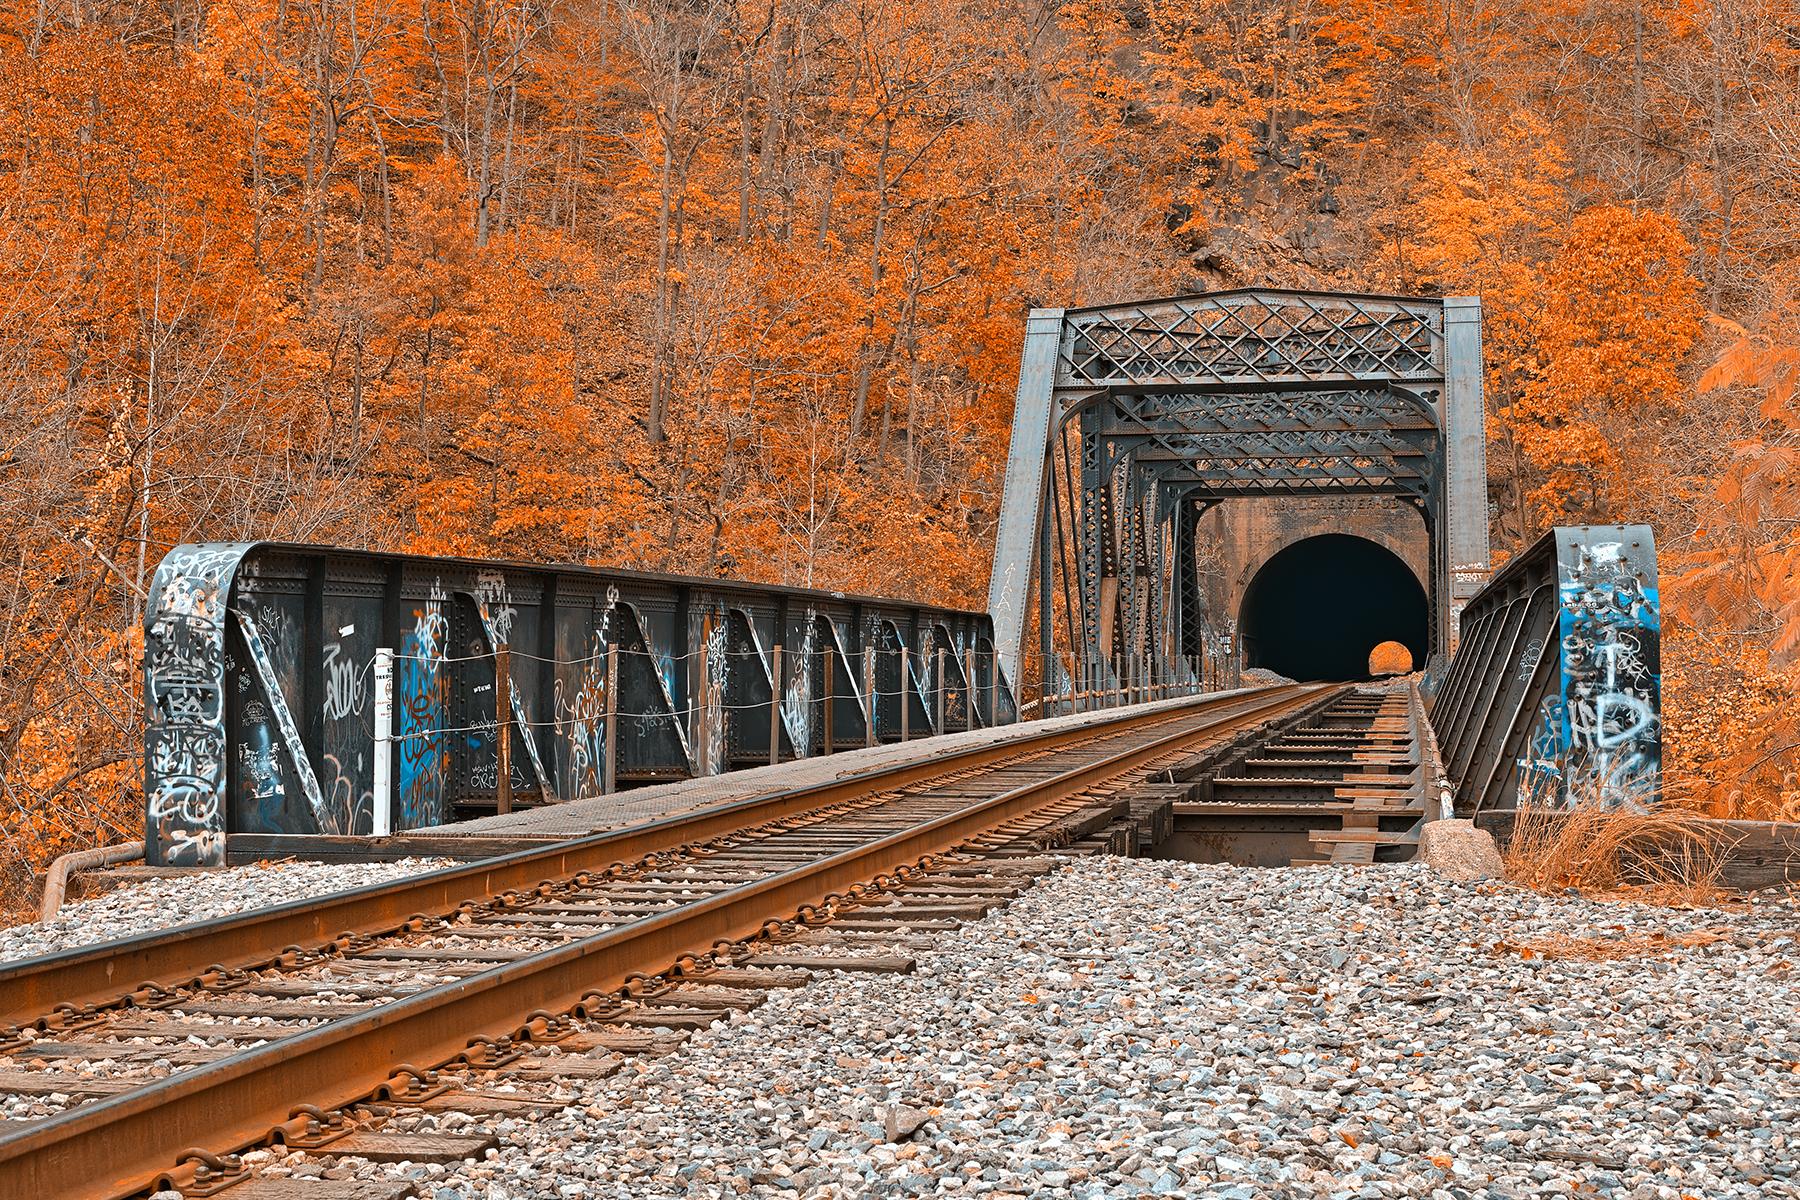 Graffiti train track - amber autumn hdr photo